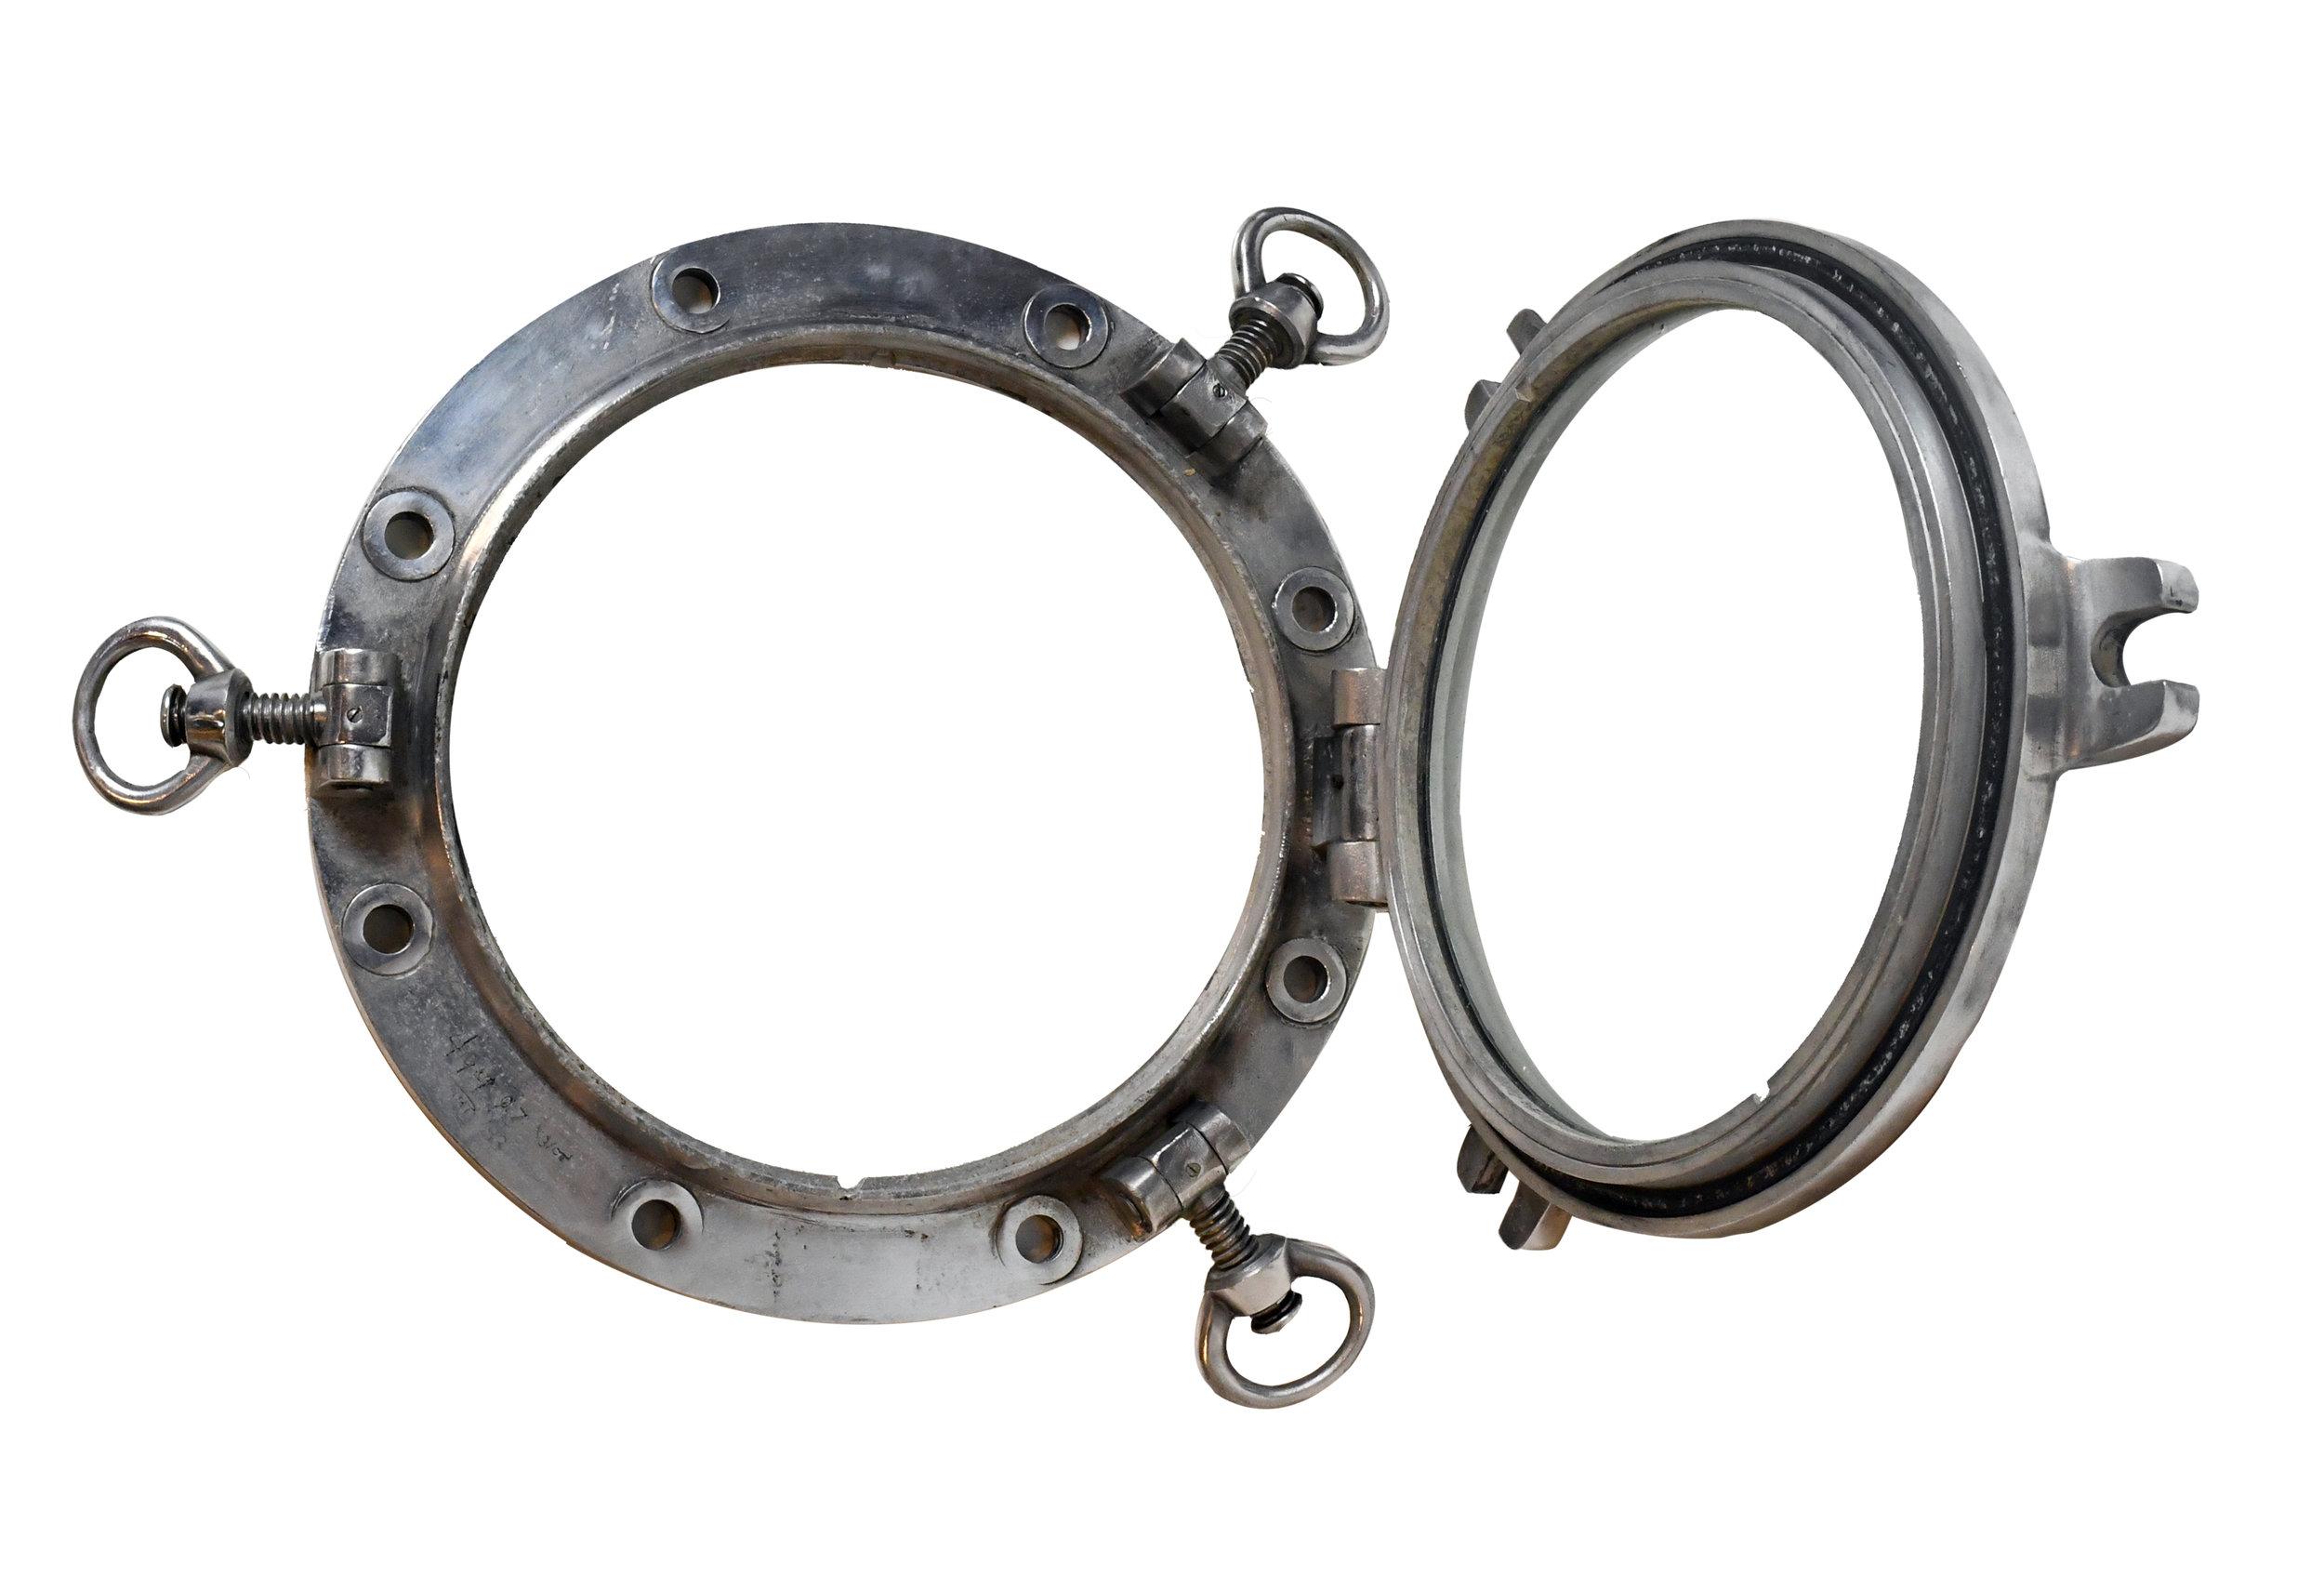 47470-porthole-nickle-plates-open-3.jpg